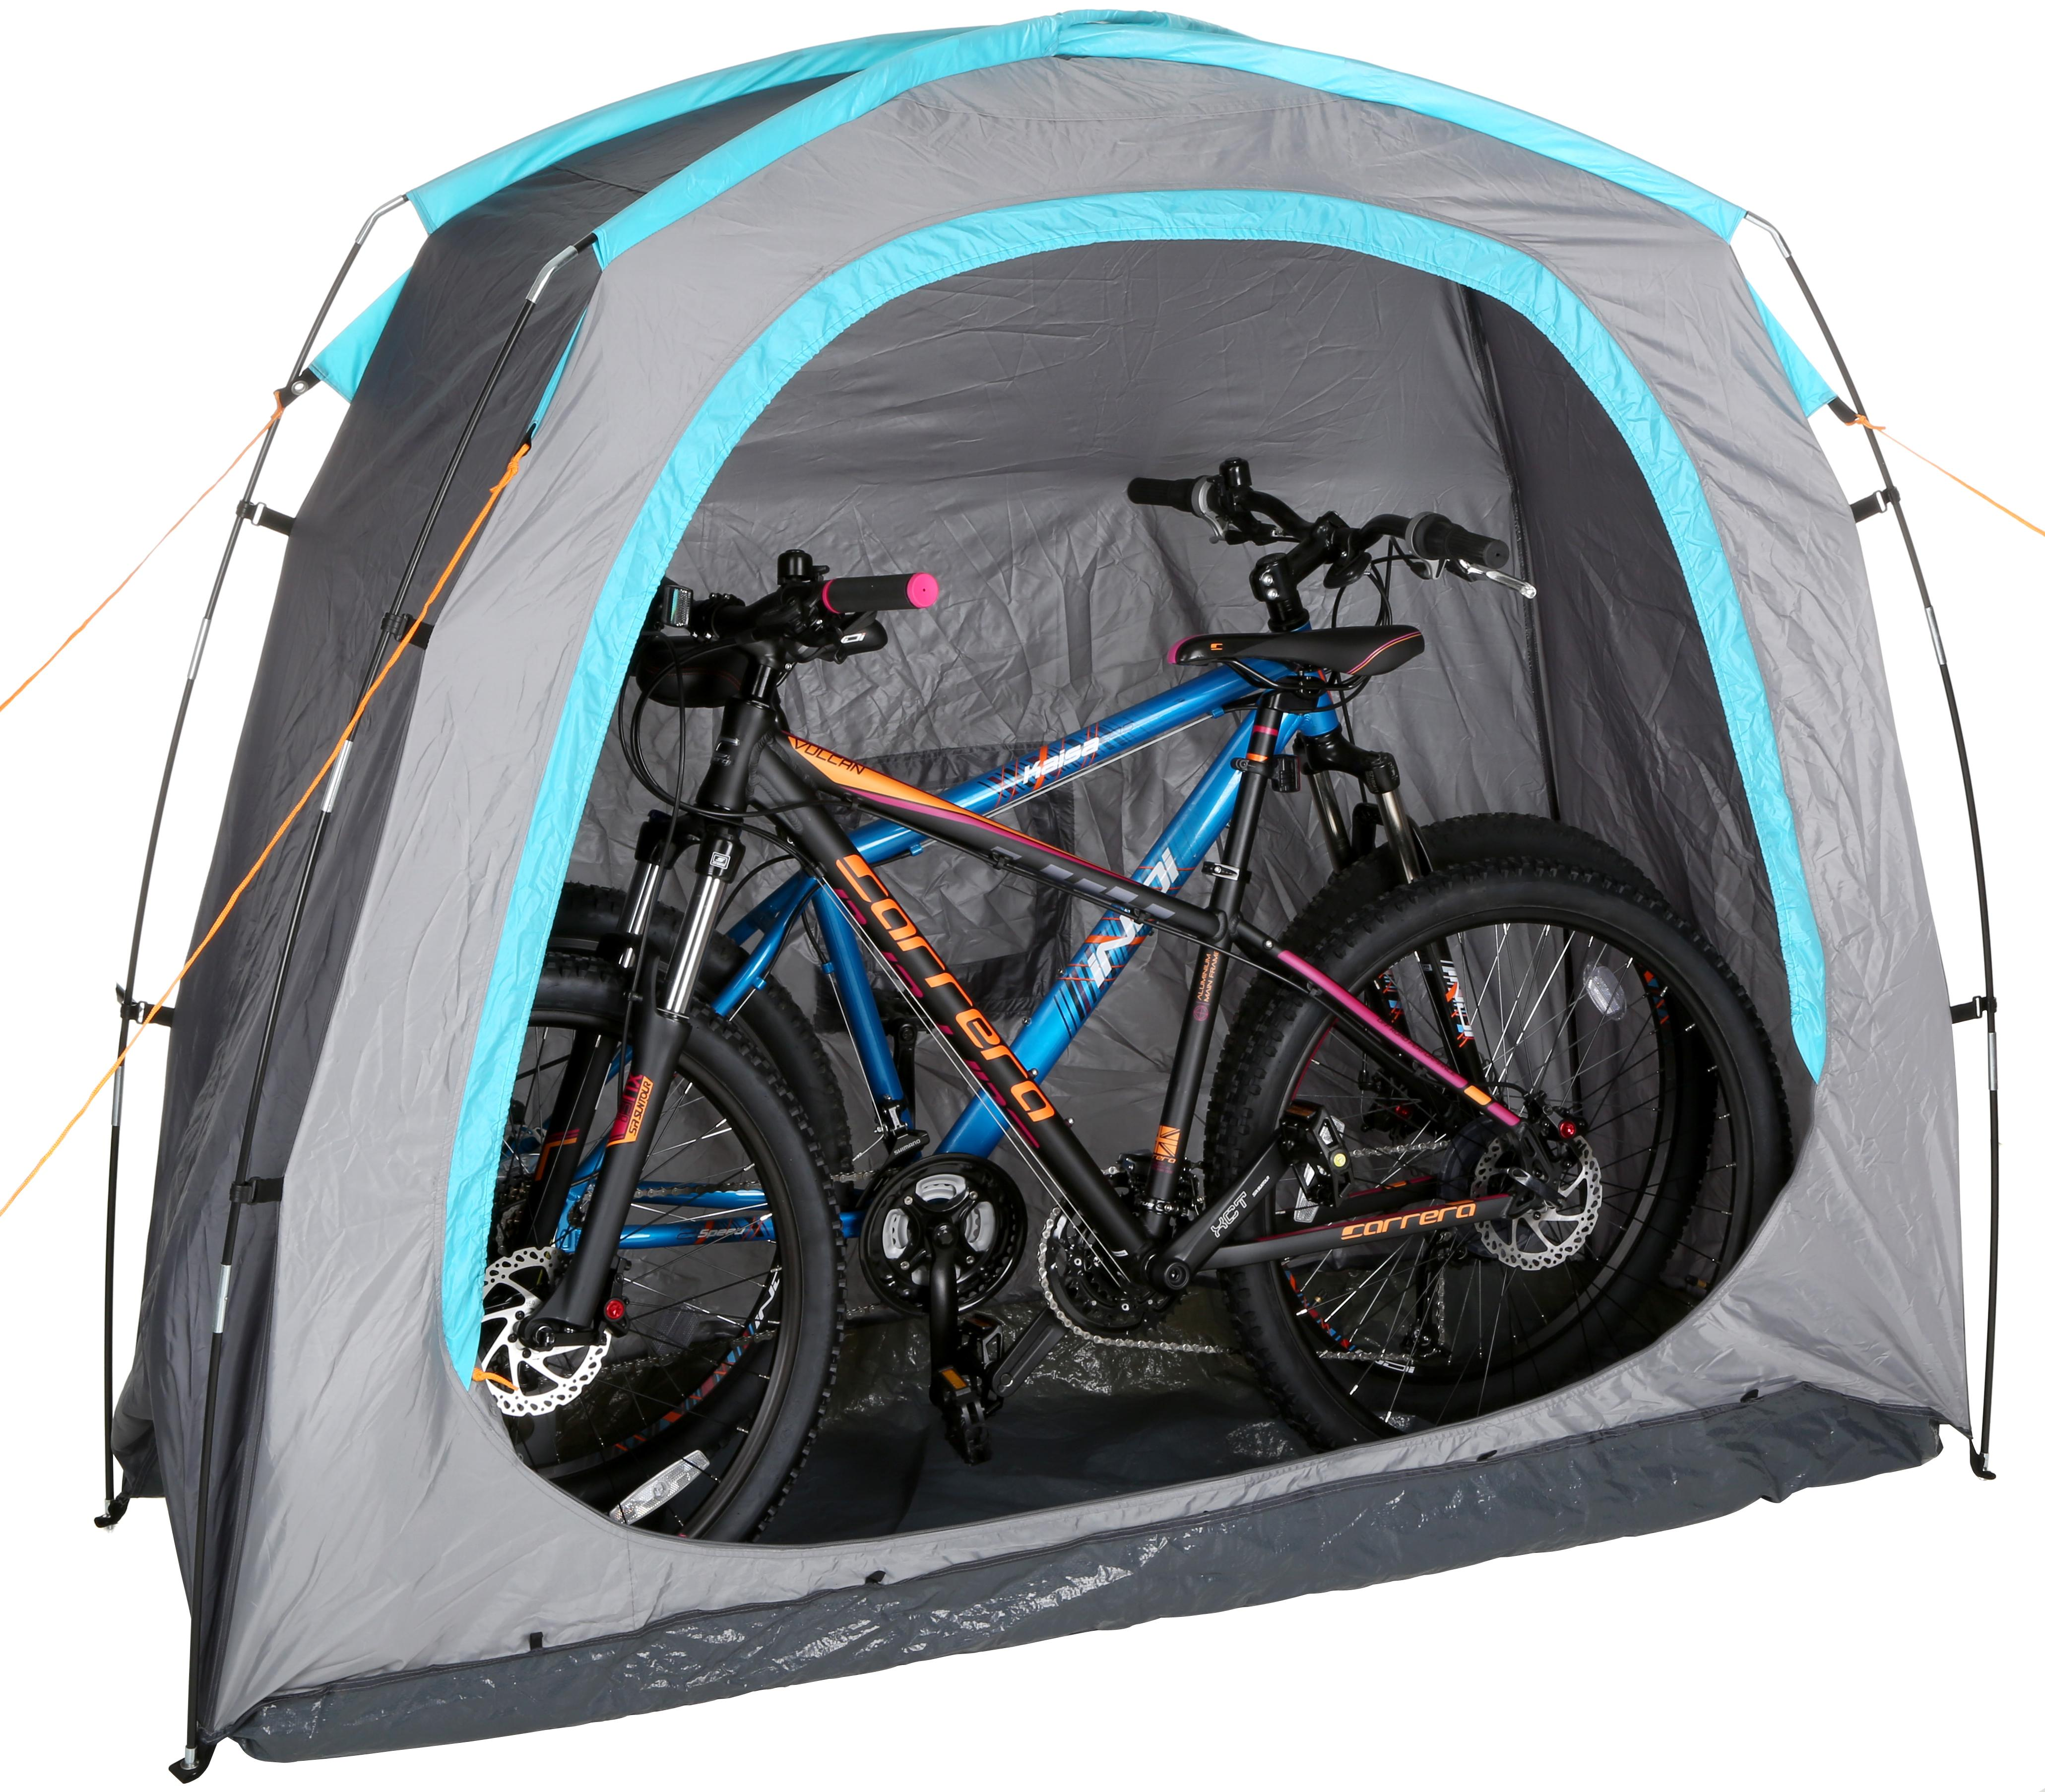 Bikehut 3 Bike Storage Tent  sc 1 st  Halfords & 3 Bike Storage Tent